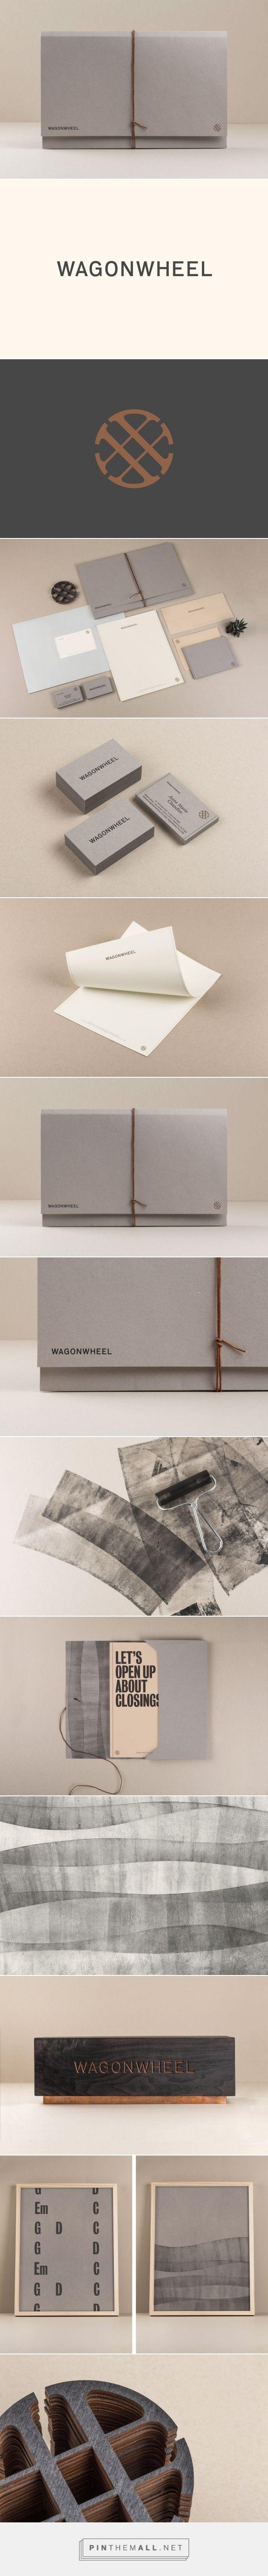 New Branding for Wagon Wheel by Perky Bros — BP&O - created via…